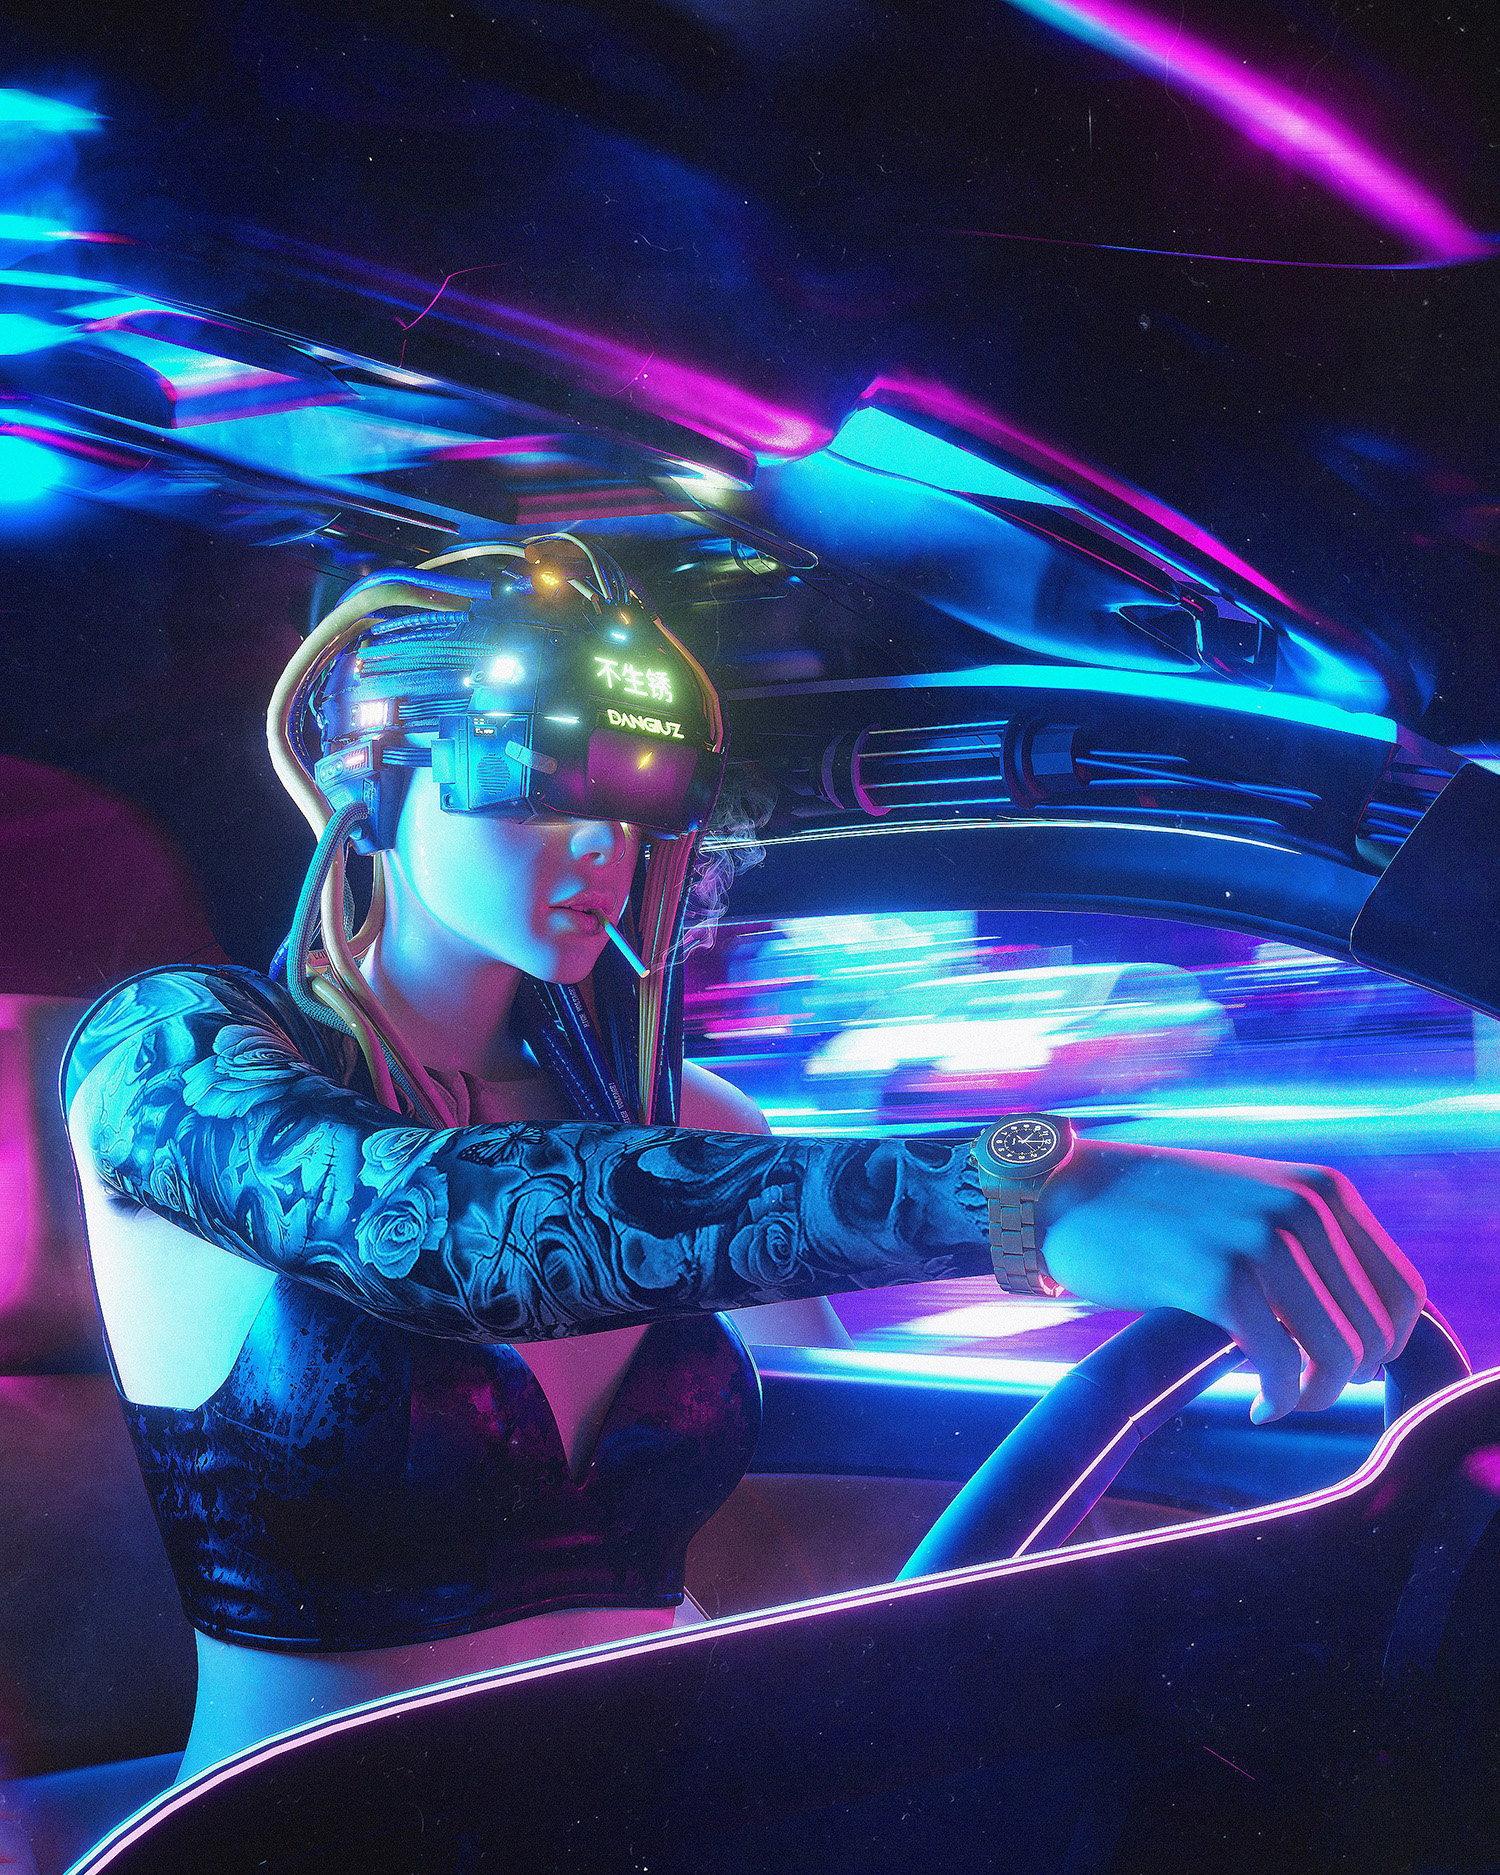 futuristic freerunner , blade runner style by Dangiuz / Leopoldo D'Angelo